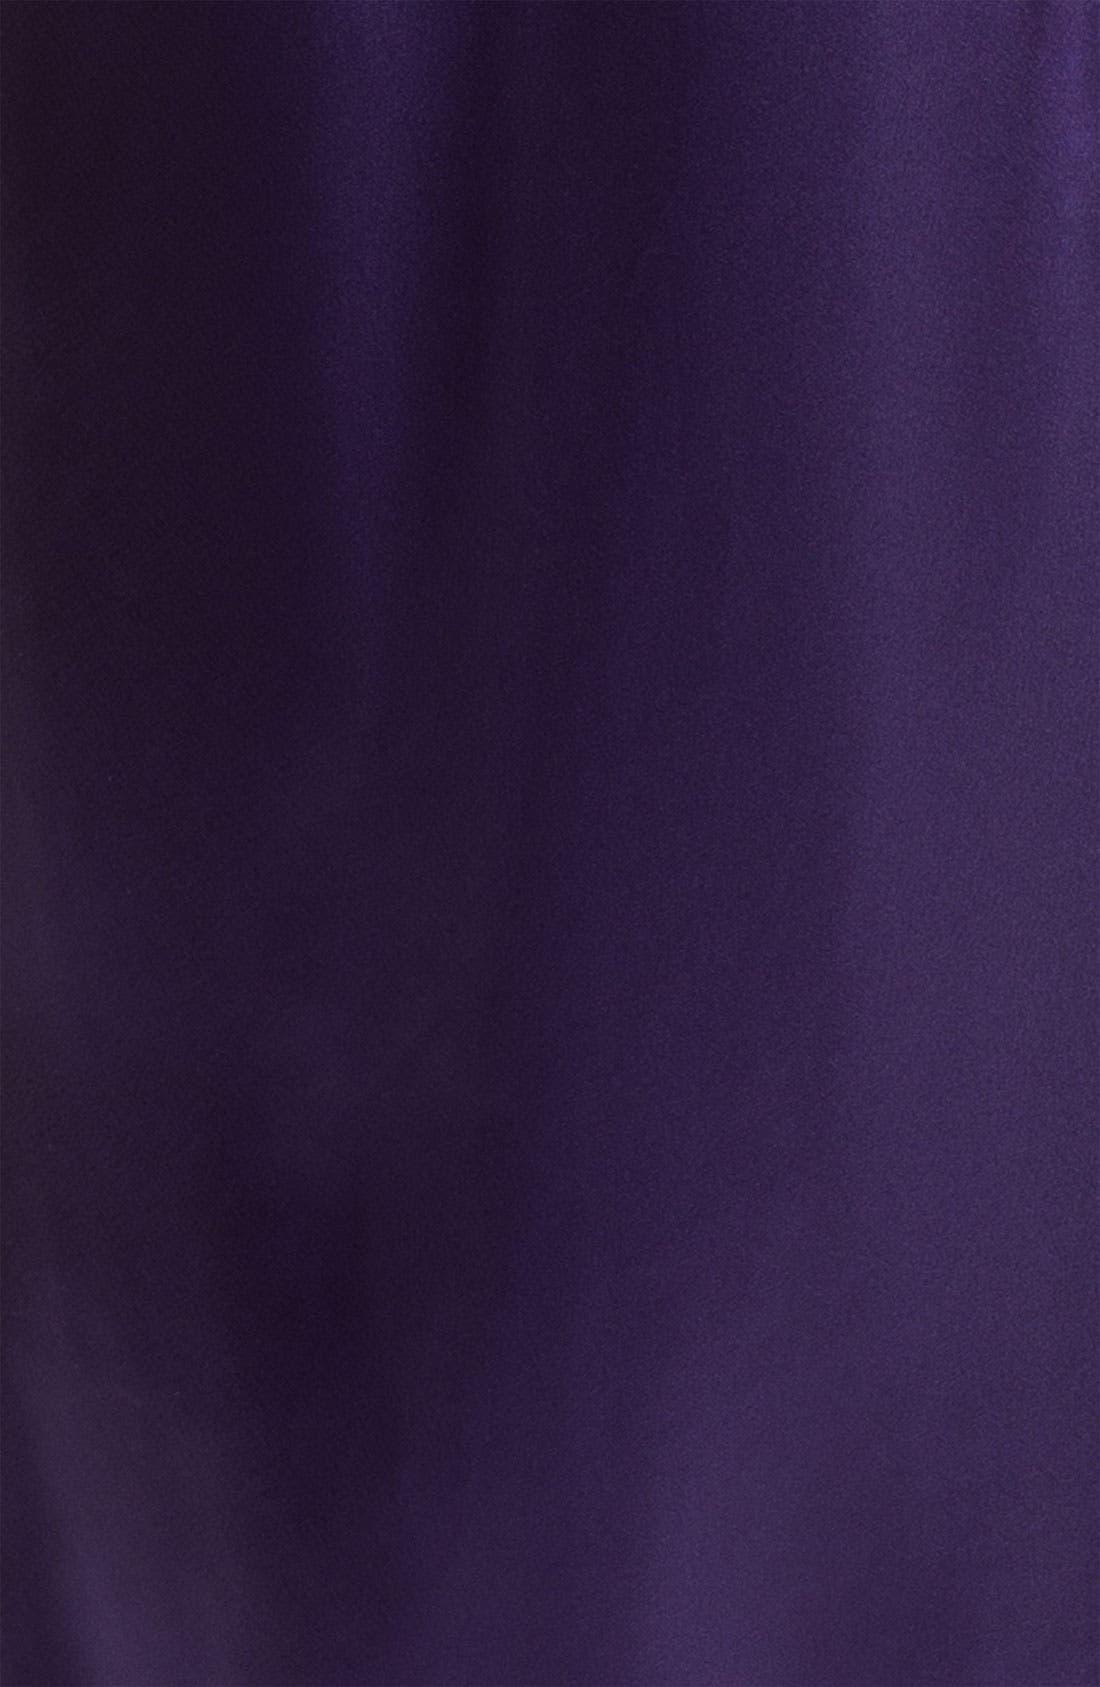 Sleepwear Lace Trim Charmeuse Robe,                             Alternate thumbnail 6, color,